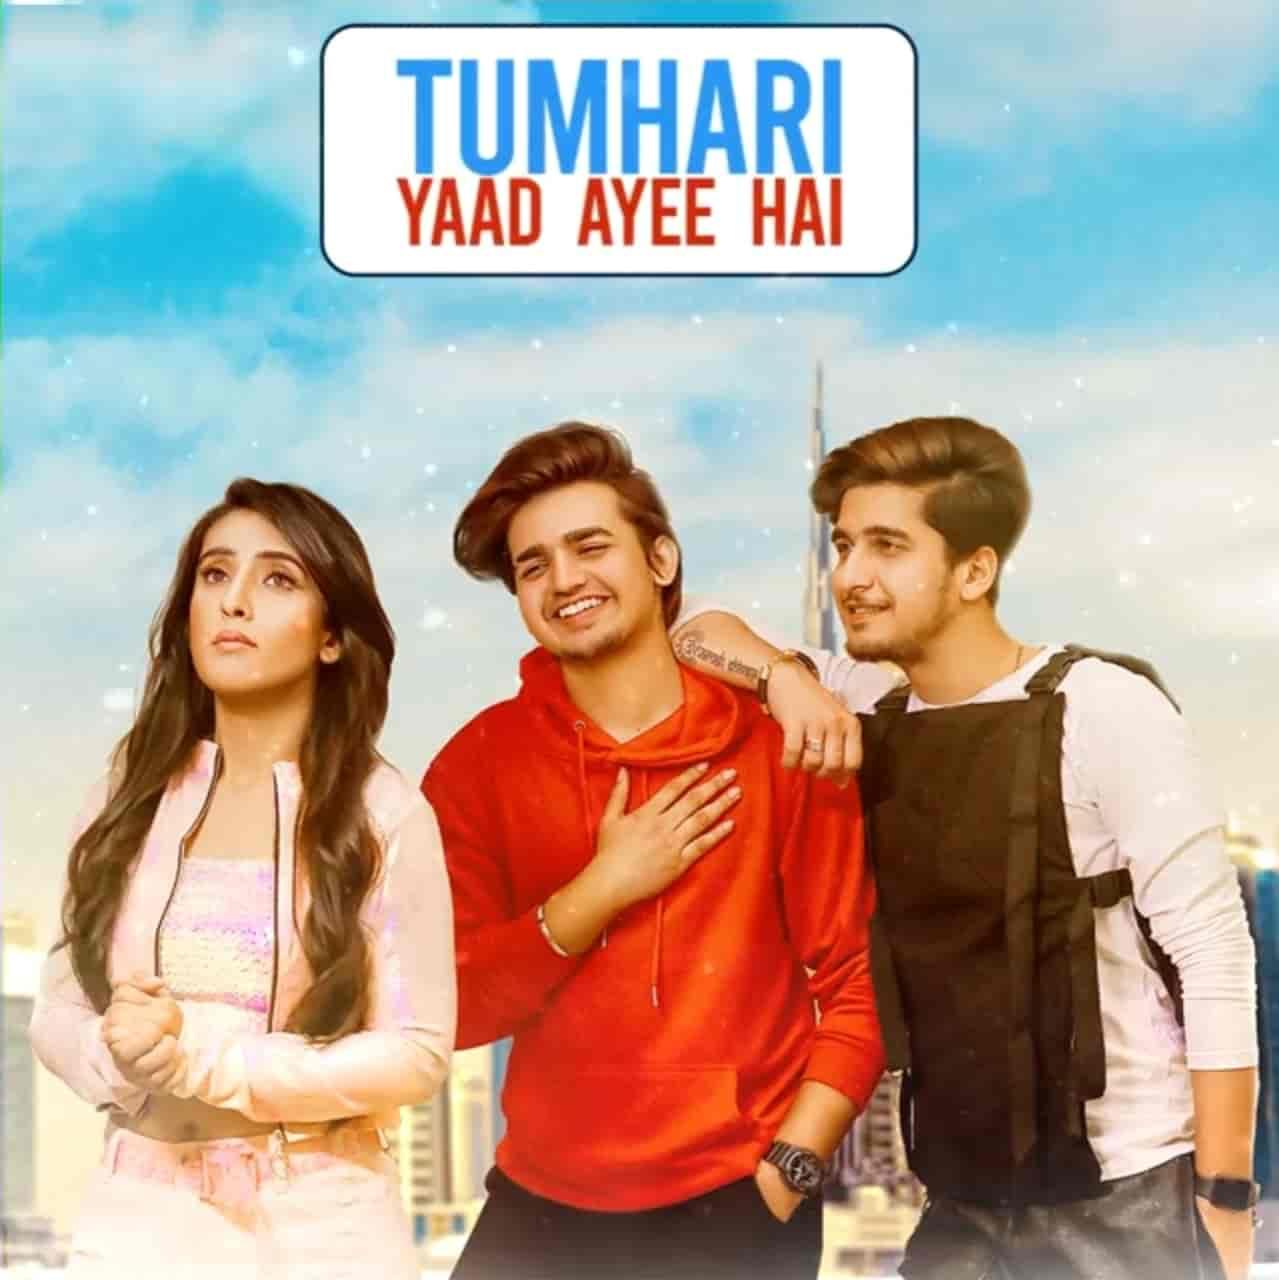 Tumhari Yaad Ayee Hai Song Image Features Sameeksha Sud, Bhavin Bhanushali and Vishal Pandey